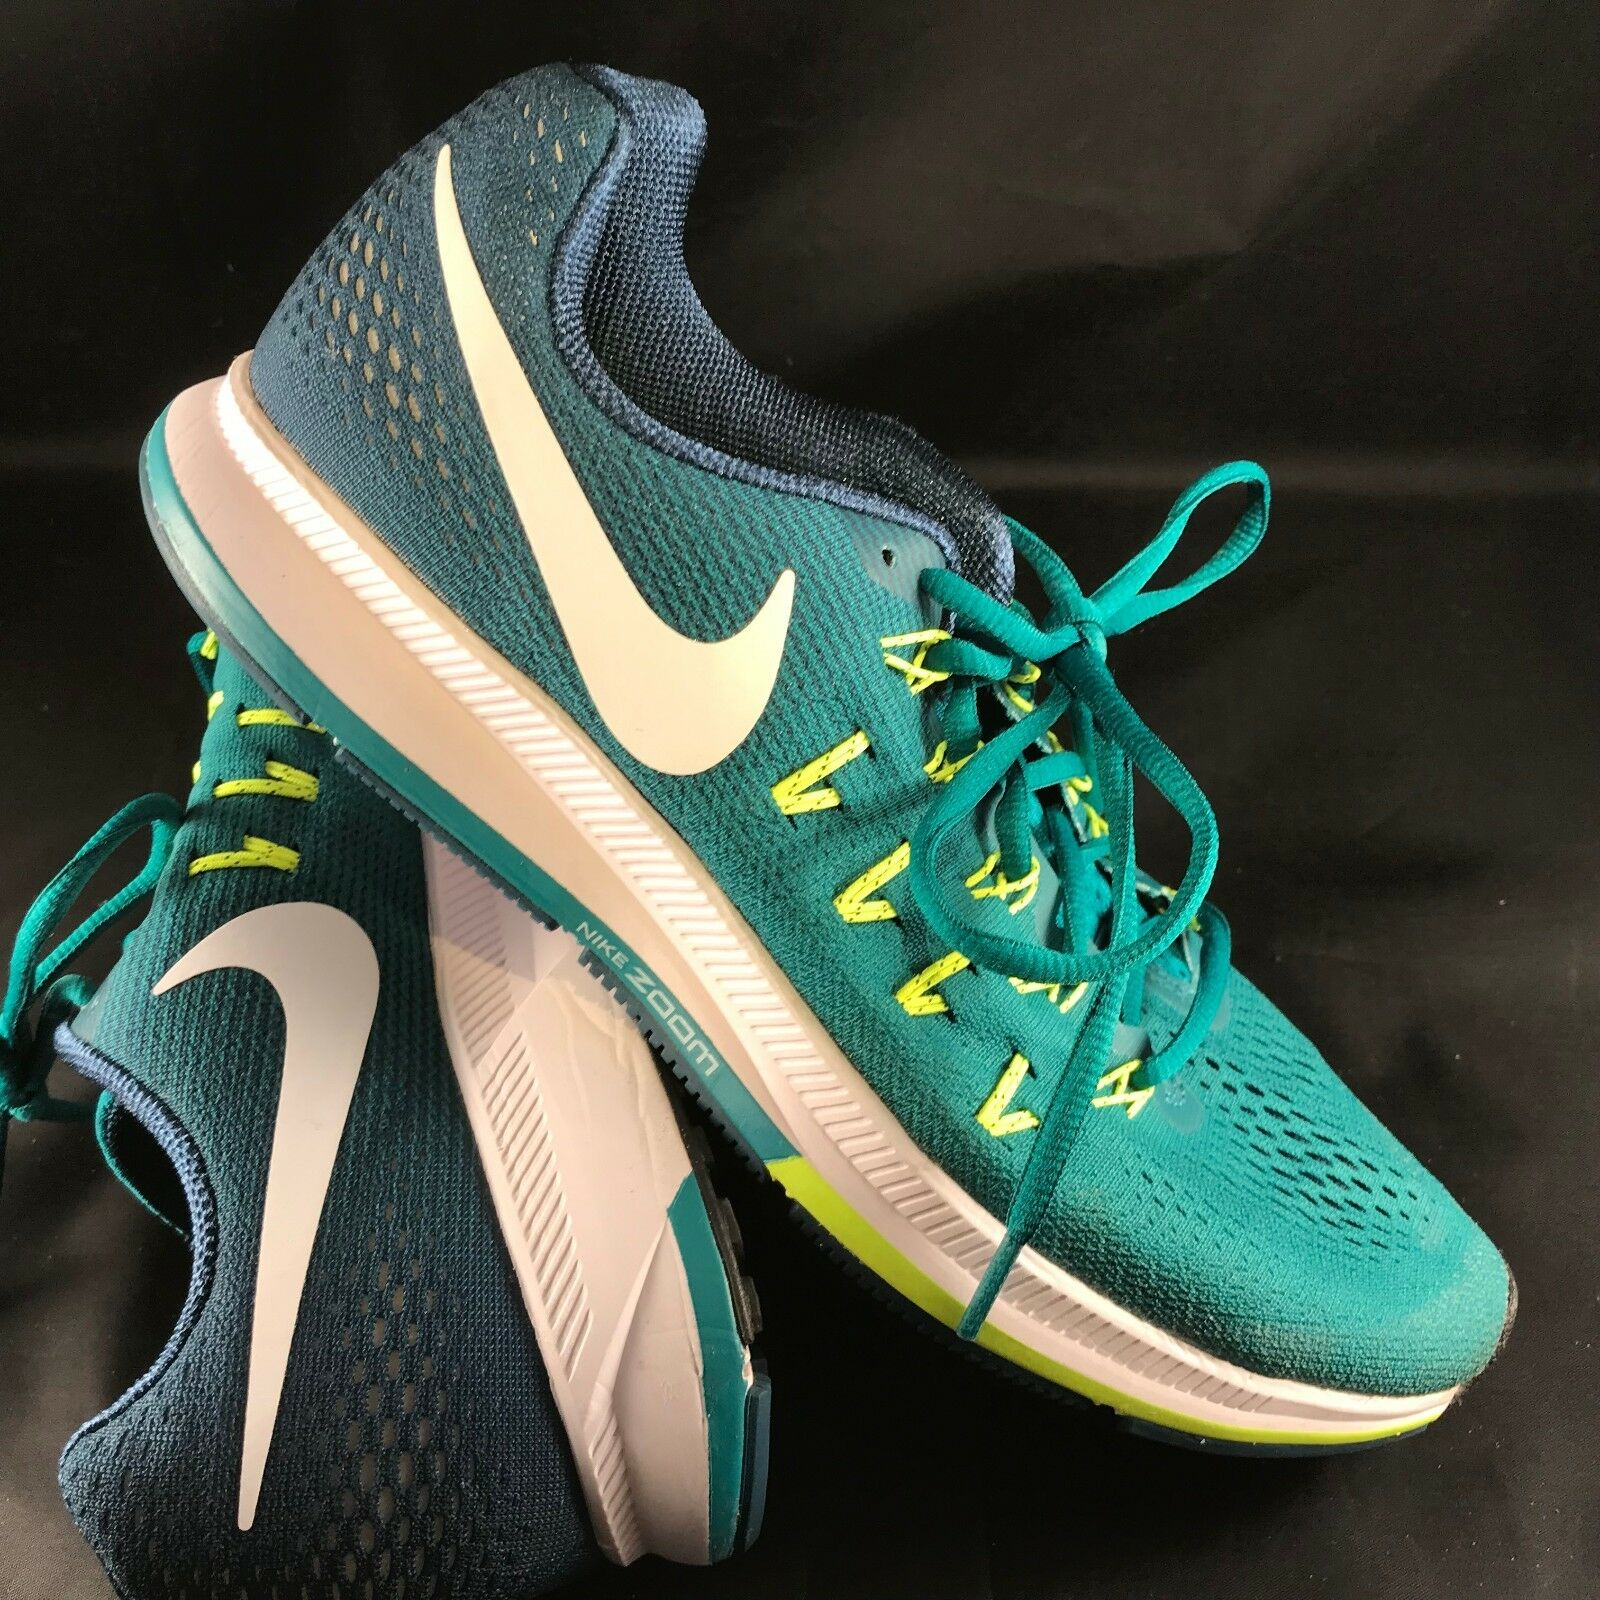 Nike Luft Zoom Pegasus 33 Schwarzes Herren 10.5 Laufen 831352 313 Blaugrün,Blau